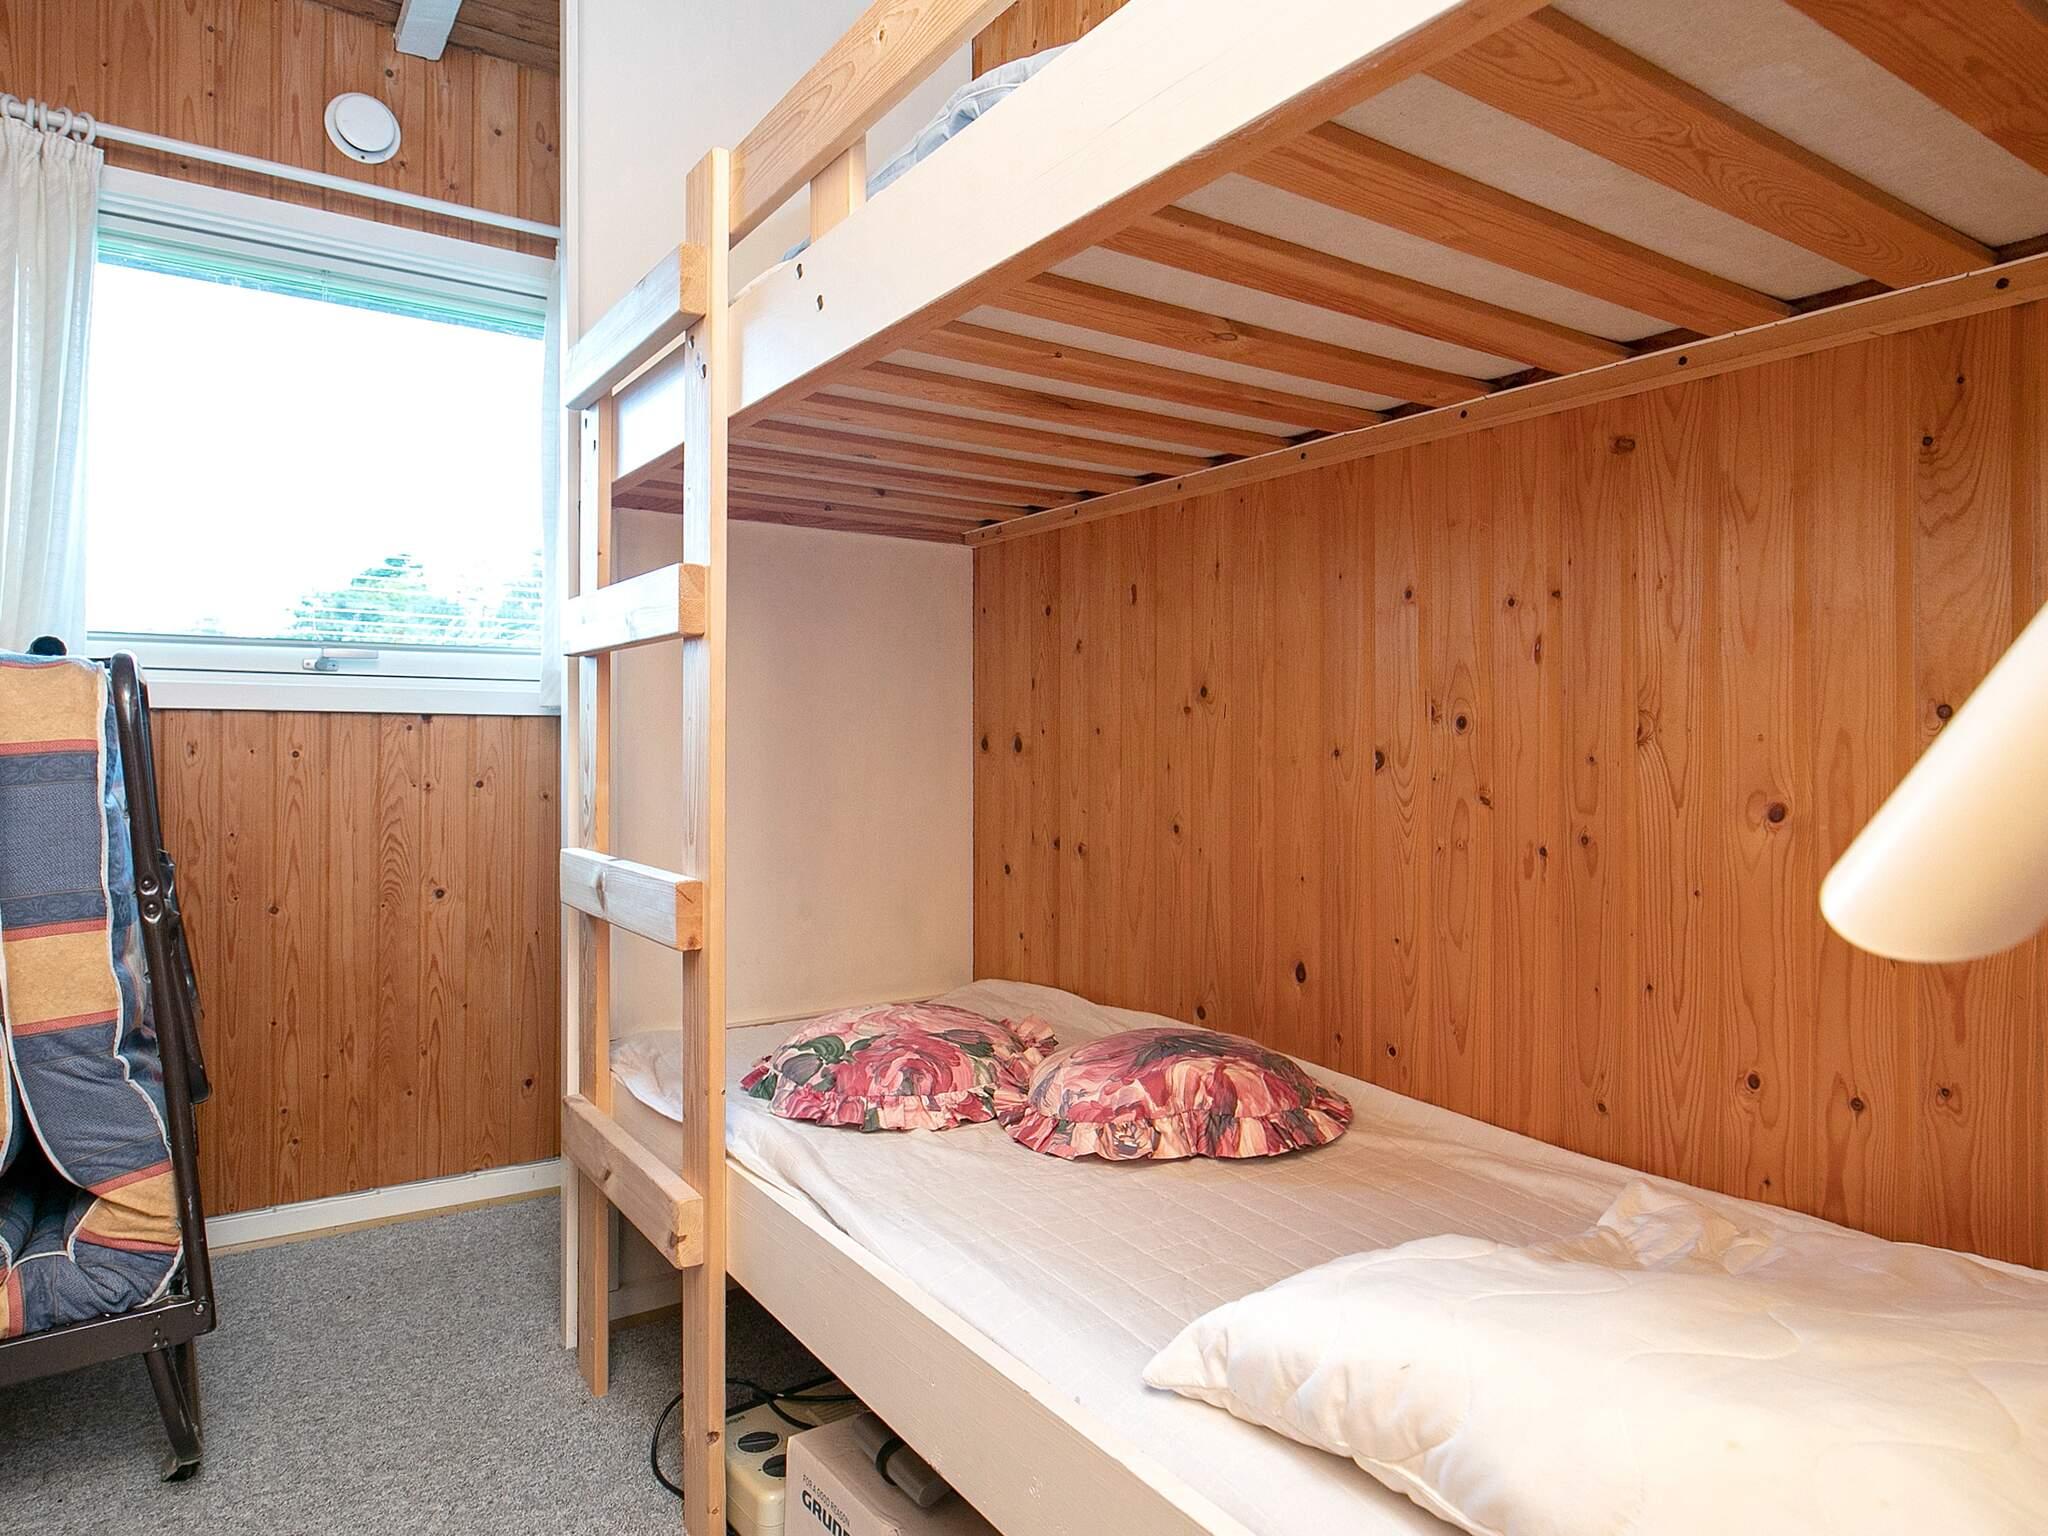 Maison de vacances Eskov Strandpark (610274), Roslev, , Limfjord, Danemark, image 13